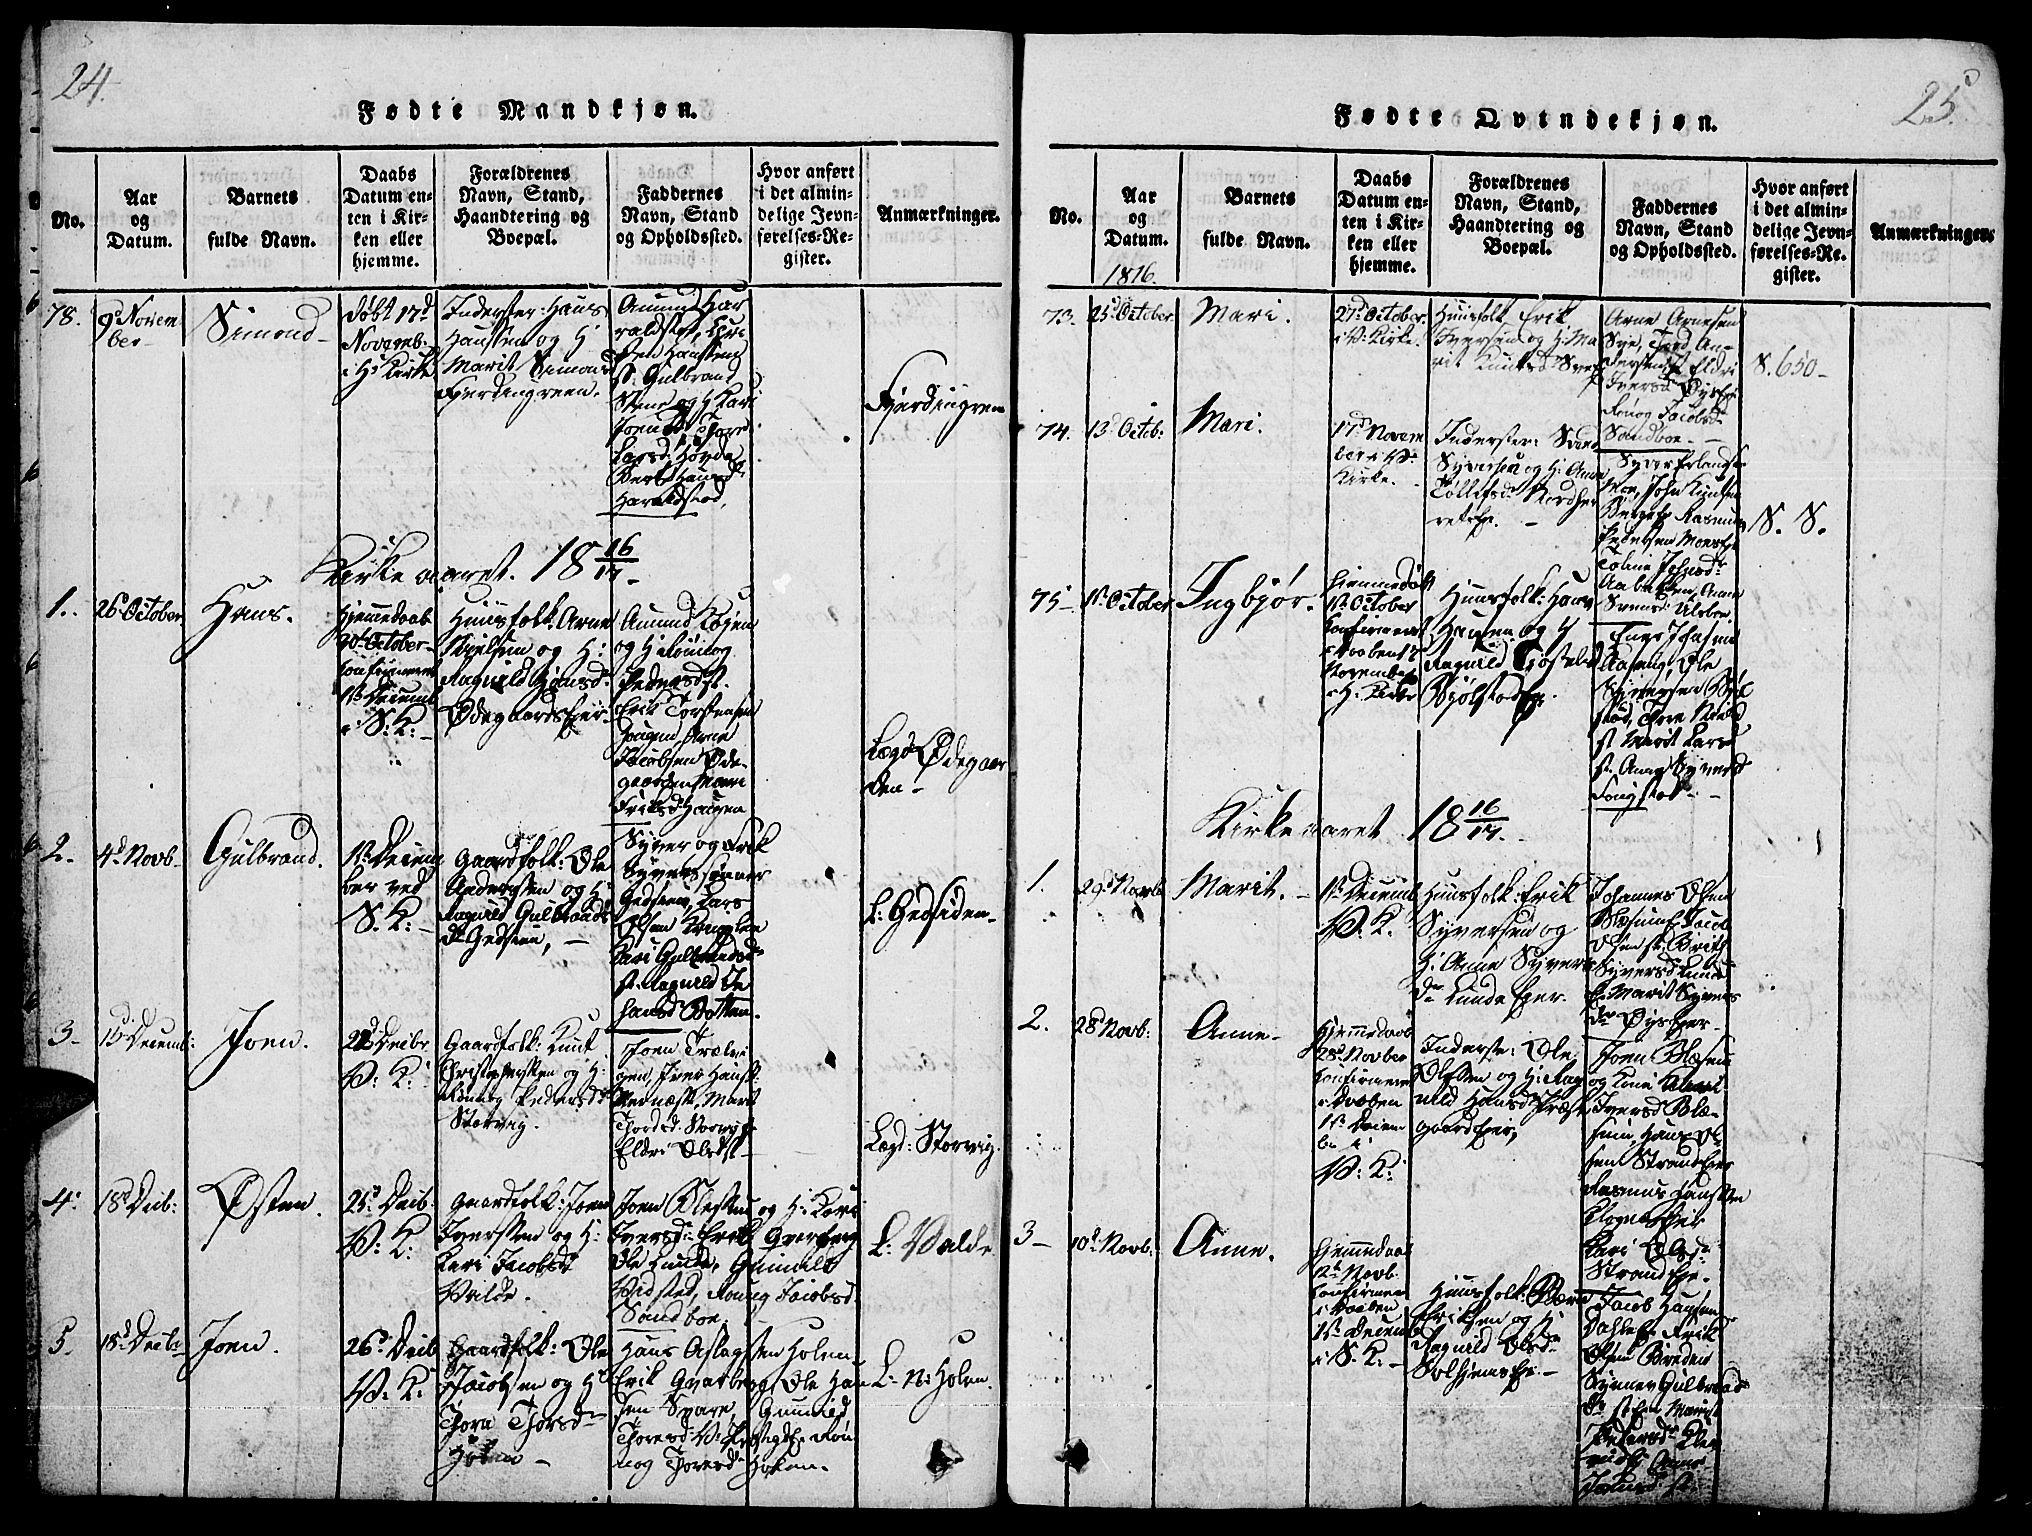 SAH, Vågå prestekontor, Ministerialbok nr. 3, 1815-1827, s. 24-25